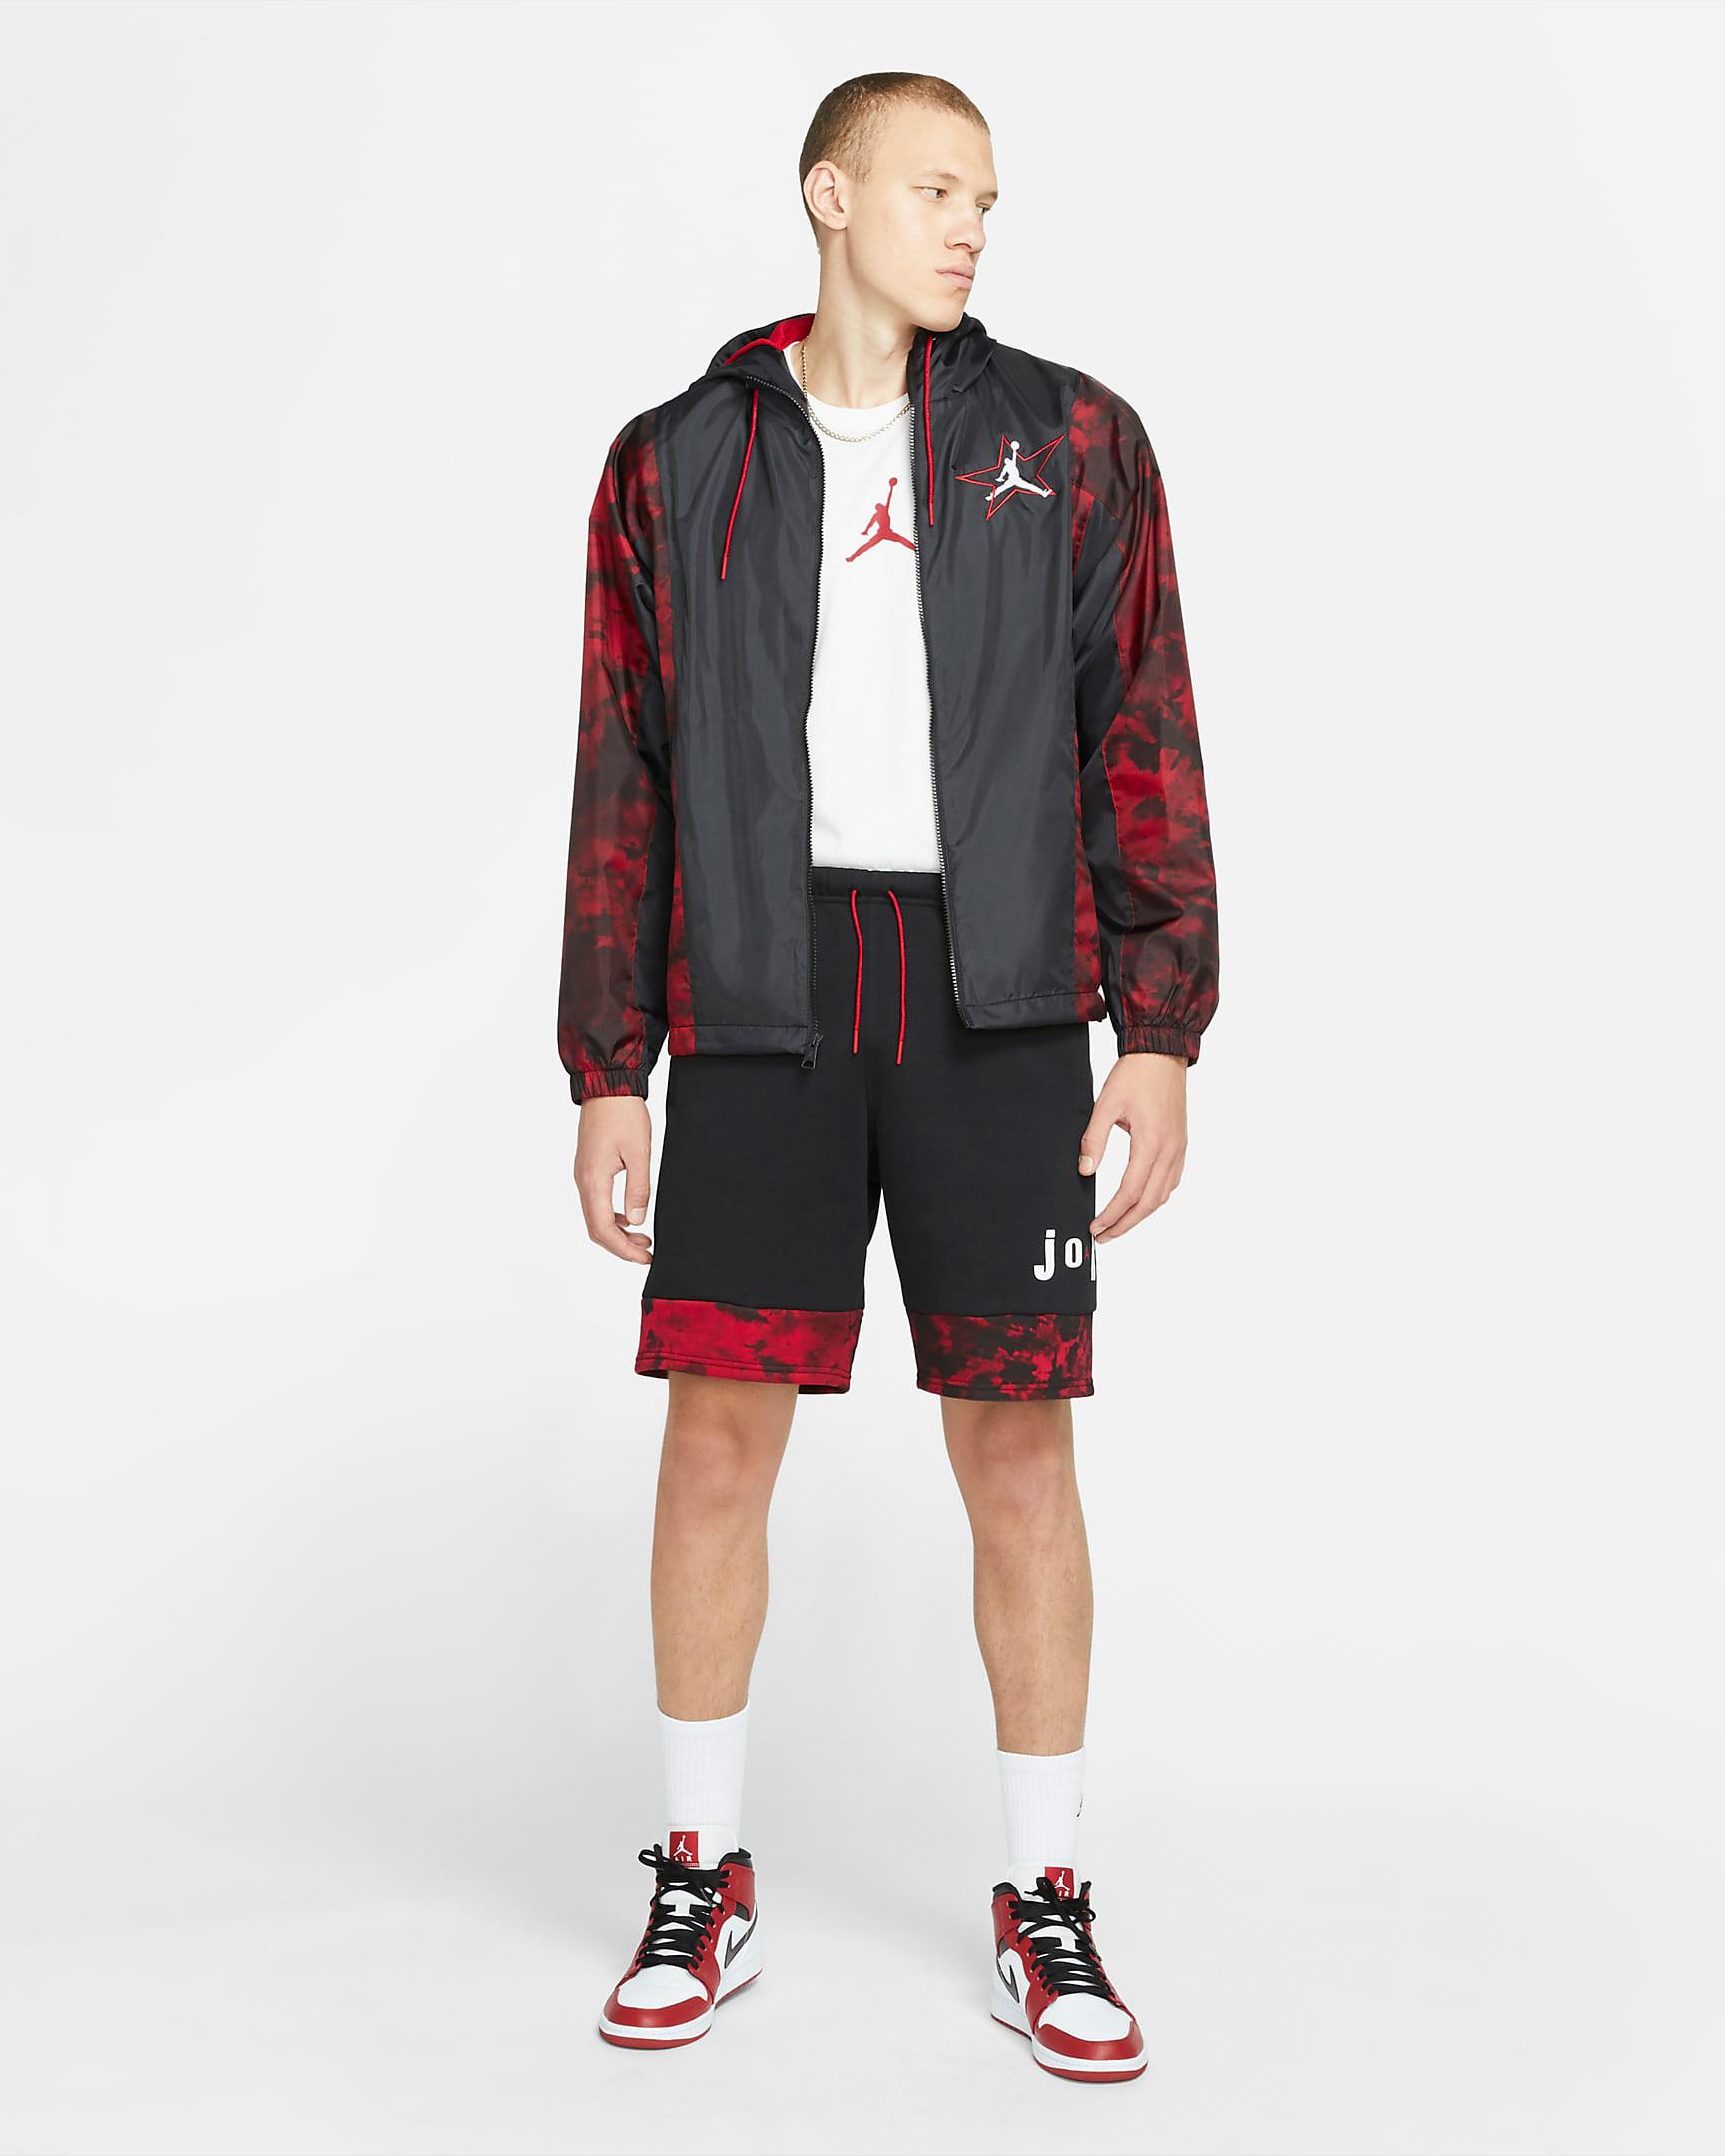 carmine-air-jordan-6-2021-shorts-jacket-outfit